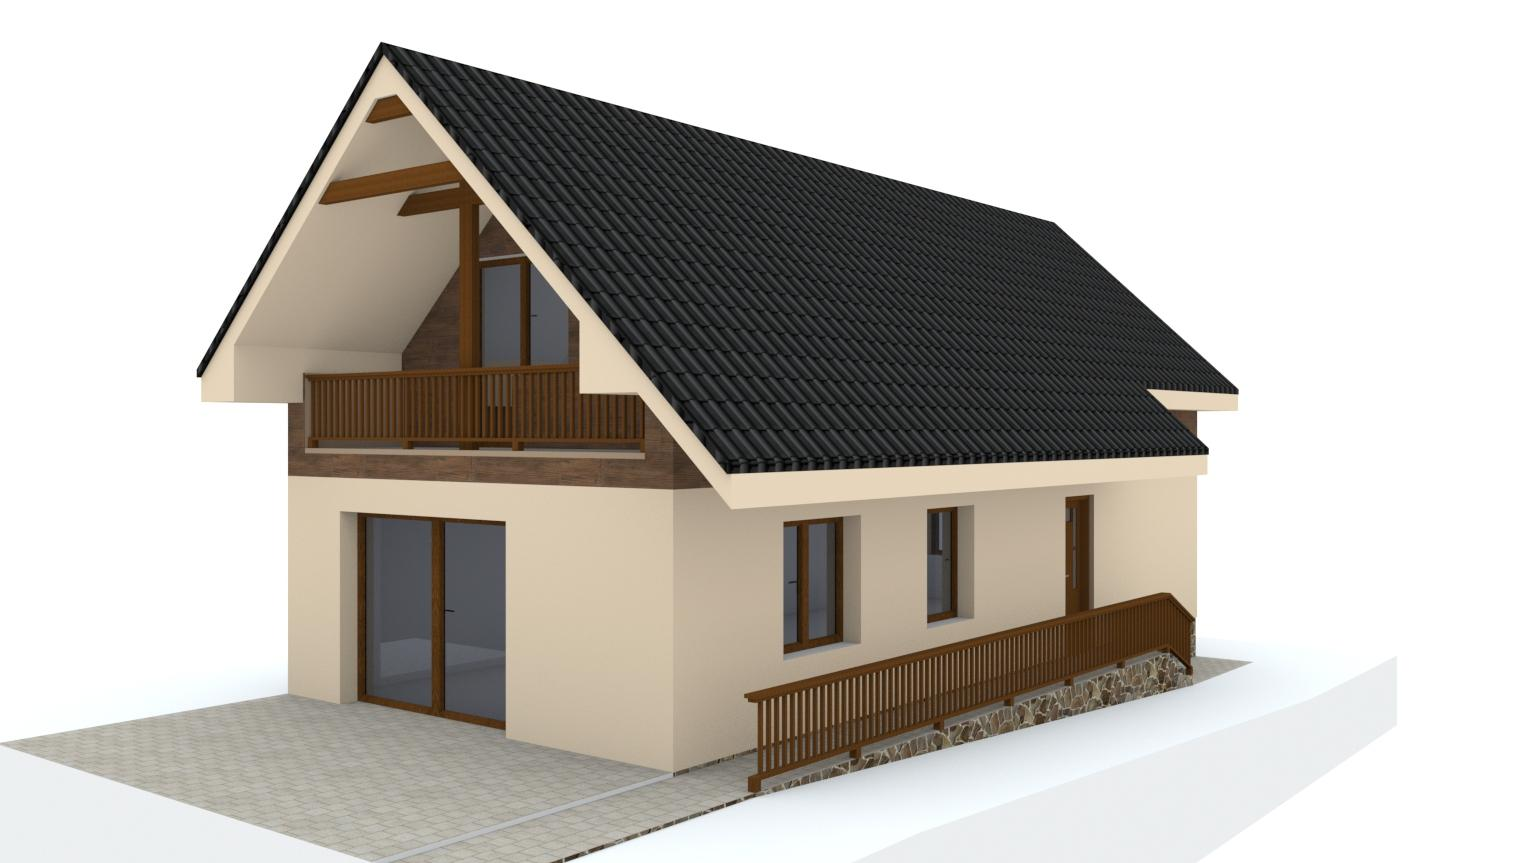 Návrh fasády rodinného domu - Obrázok č. 12